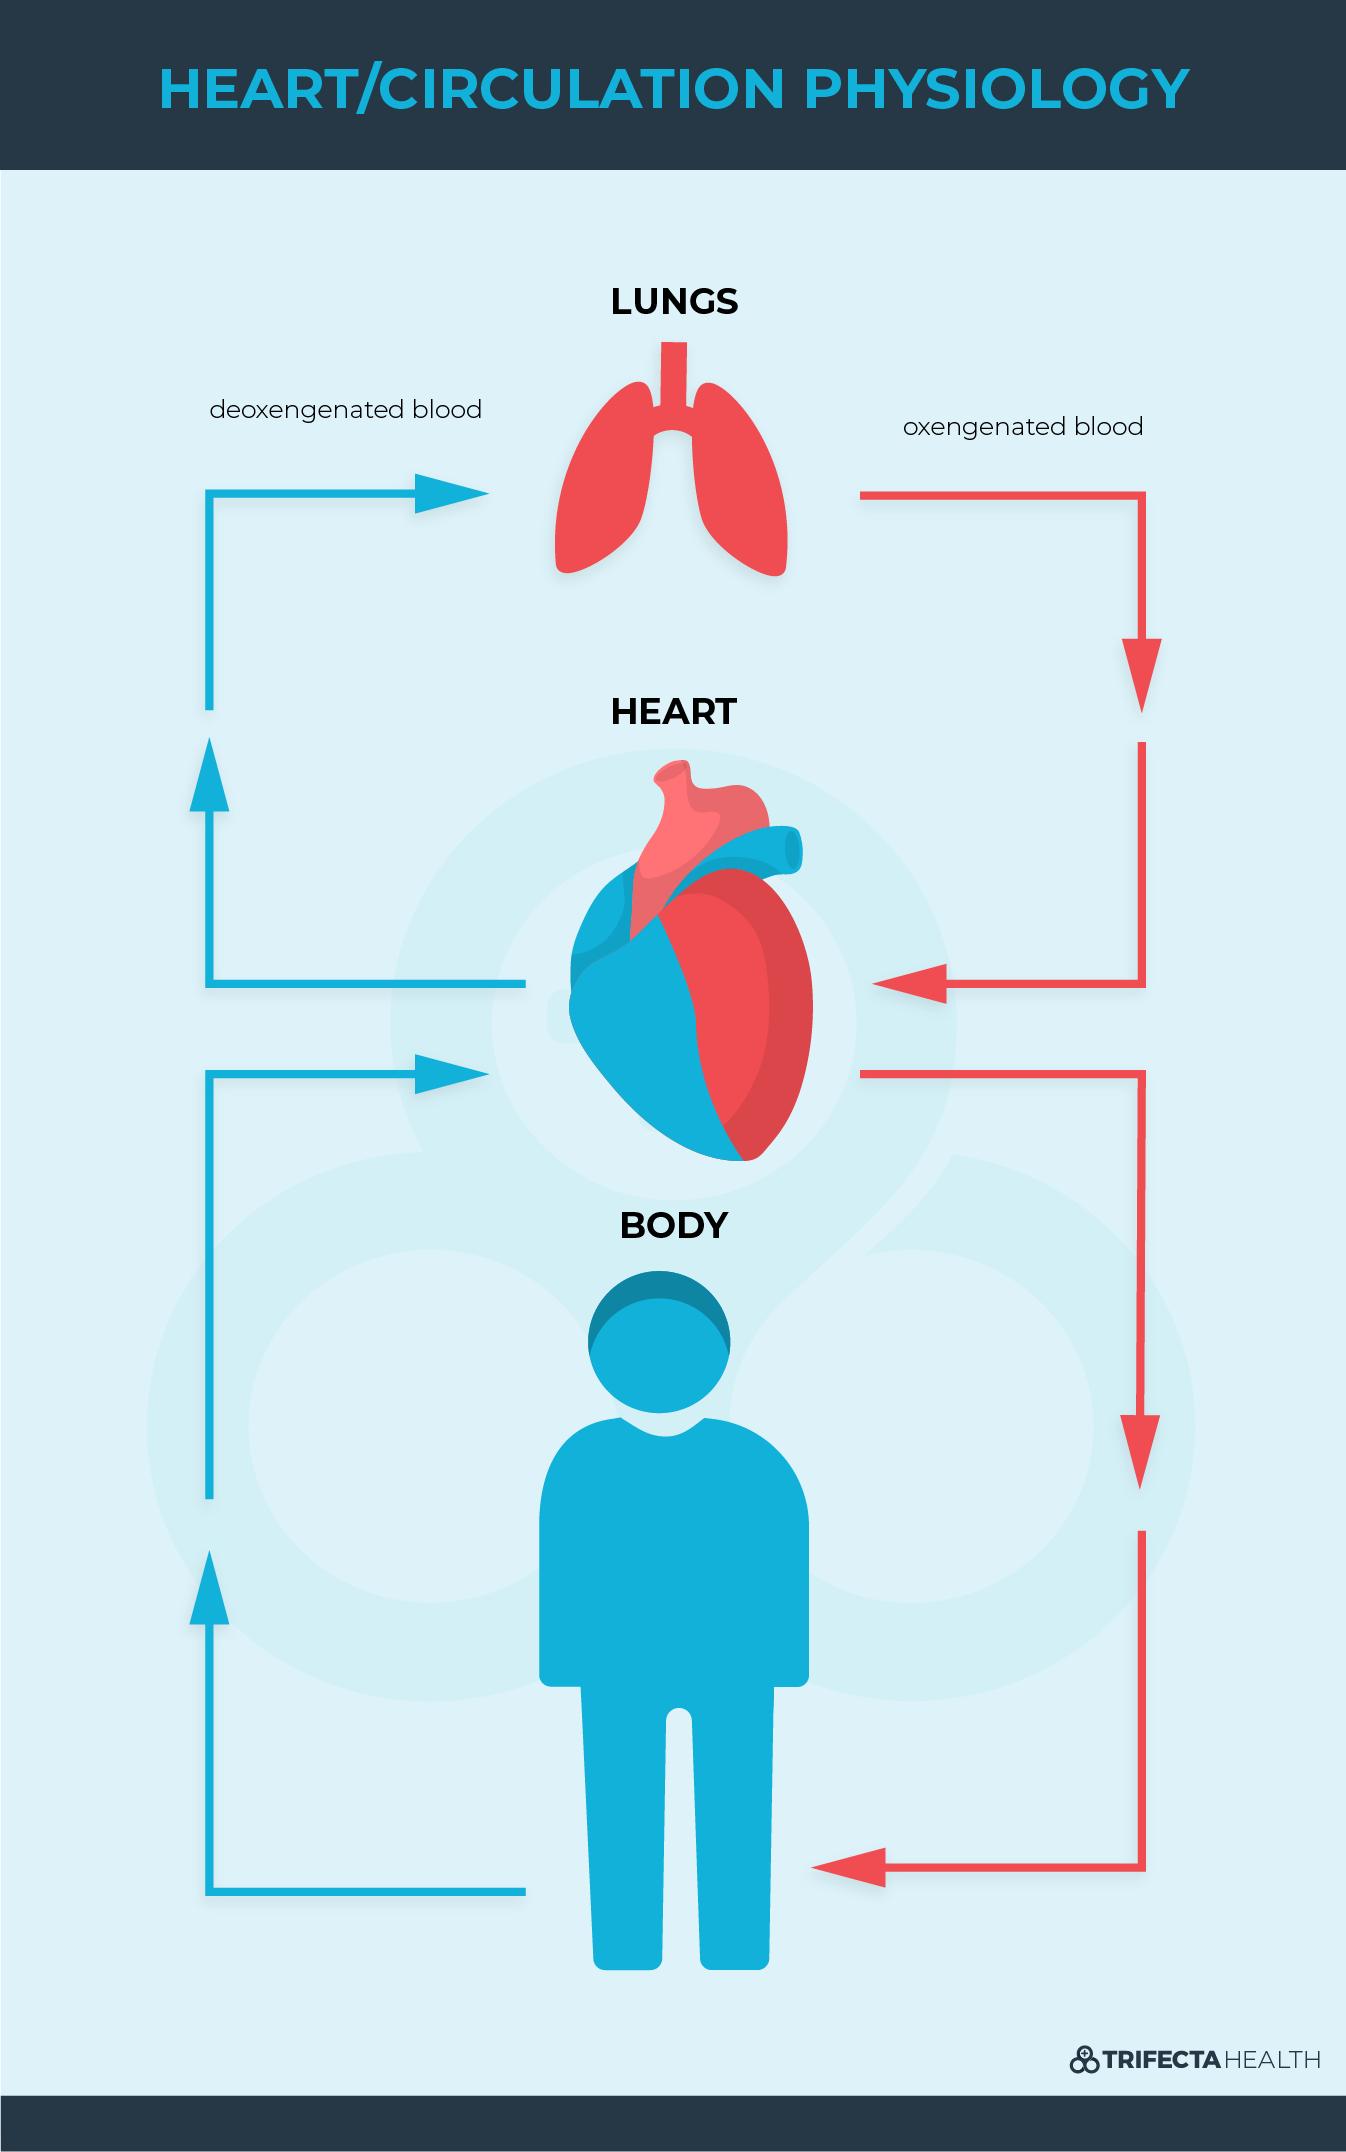 Diagrams_ Heart-circulation physiology